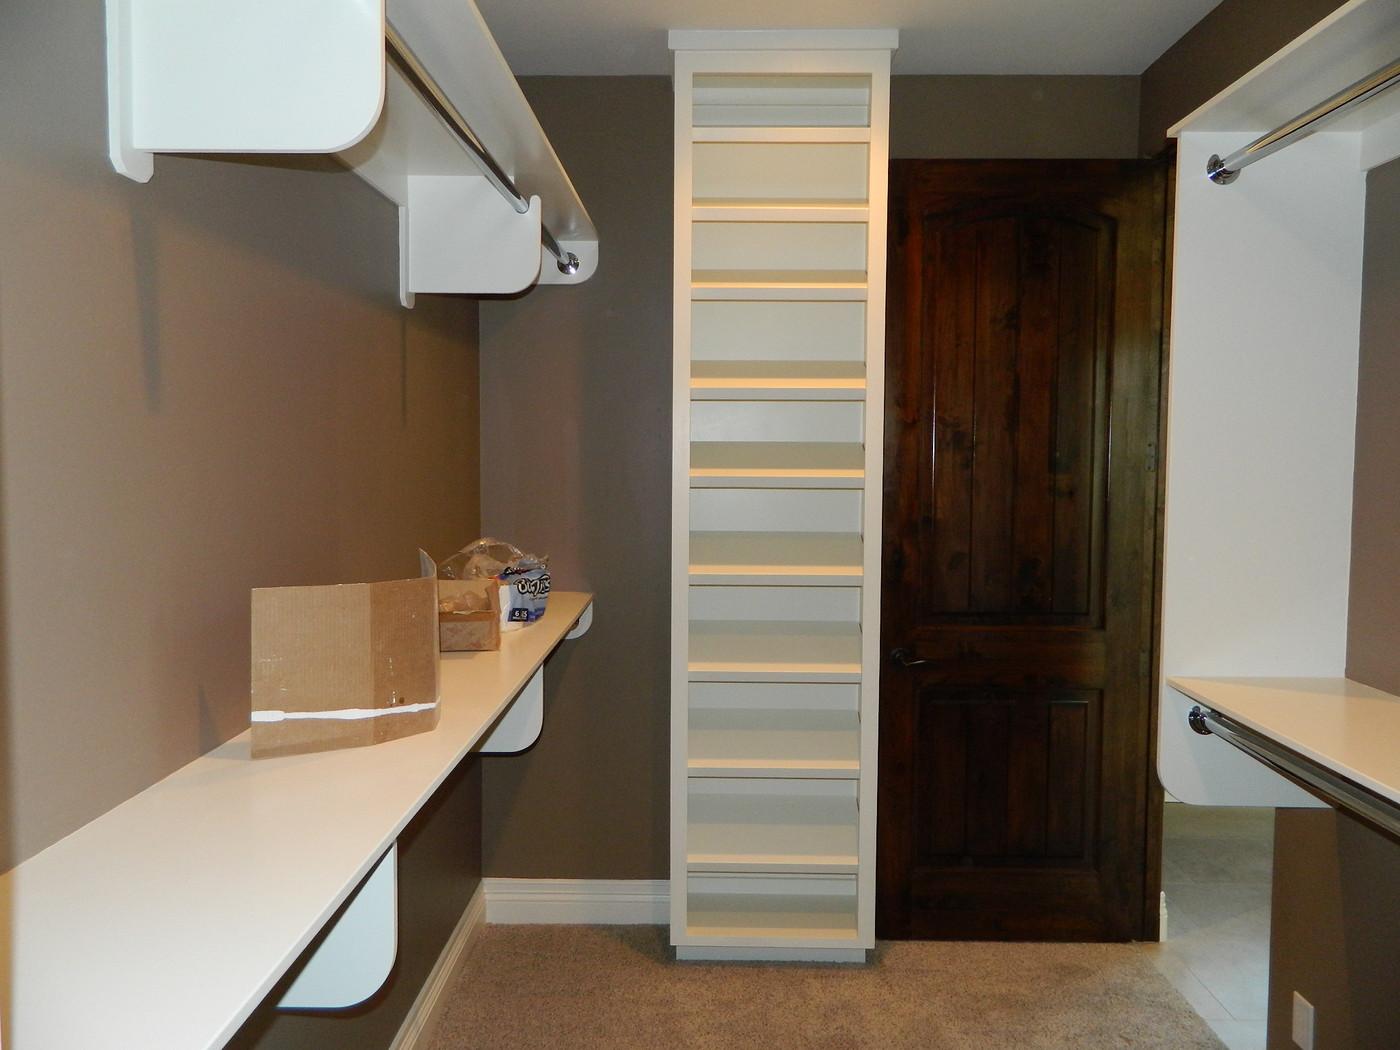 Cabinets029-vi.jpg